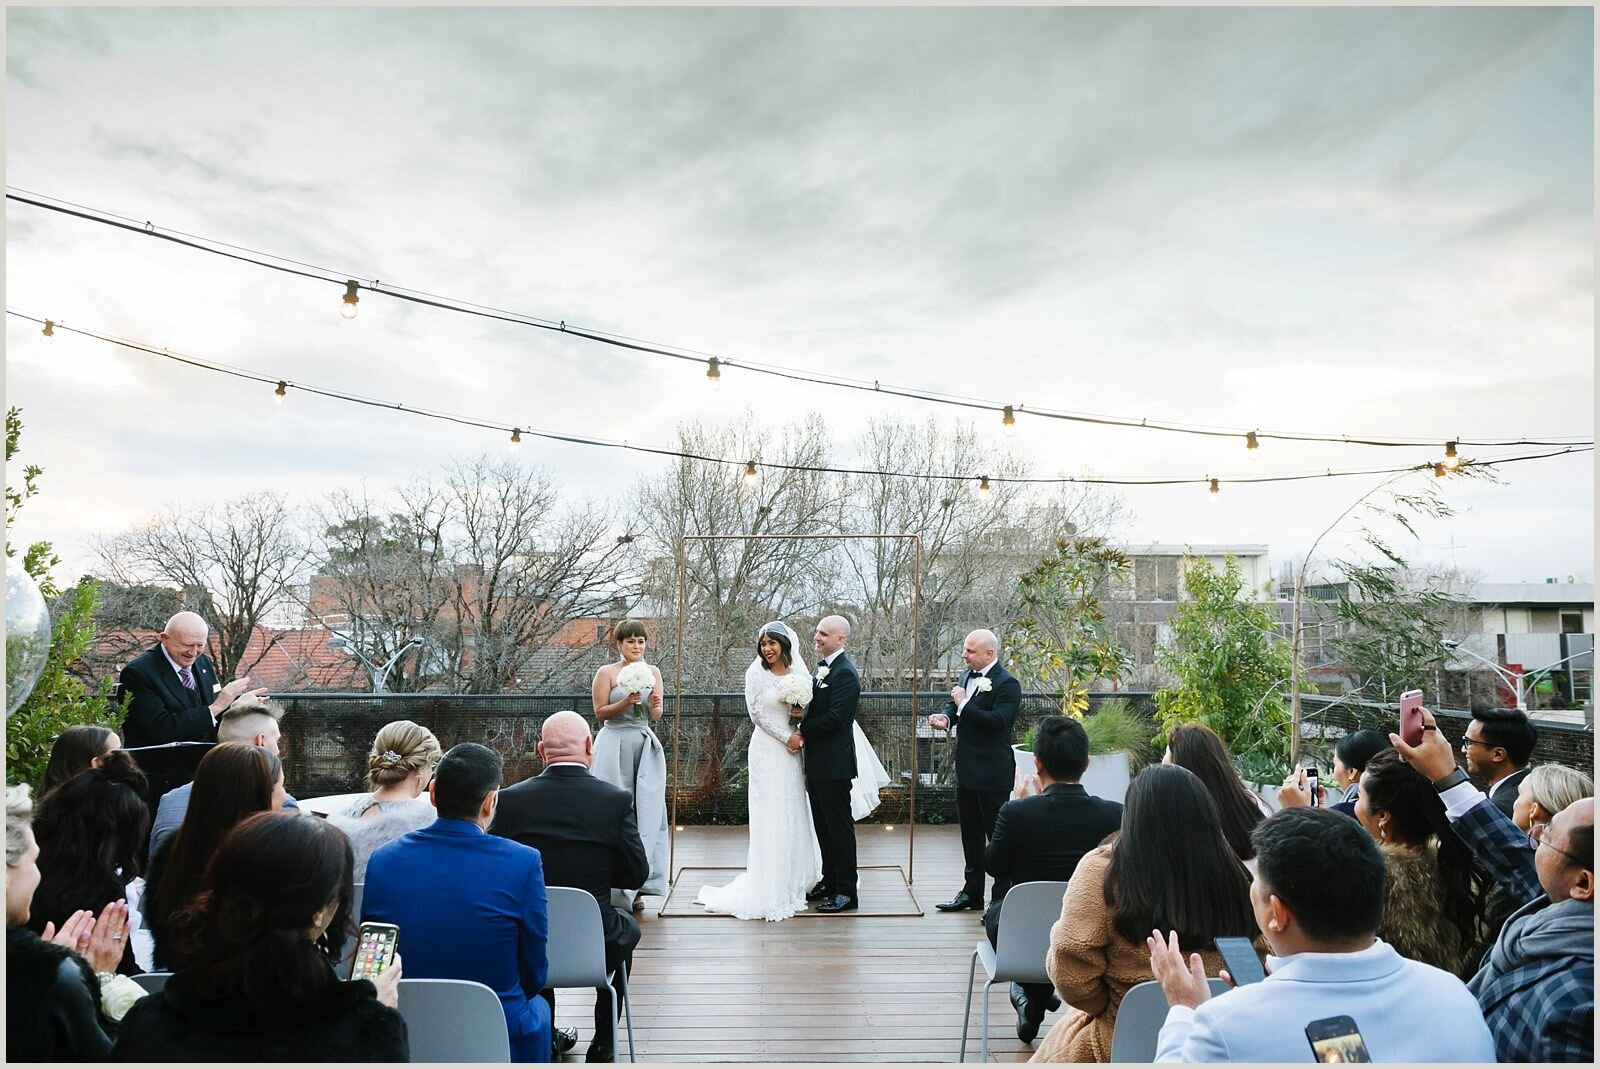 joseph_koprek_wedding_melbourne_the_prince_deck_0052.jpg